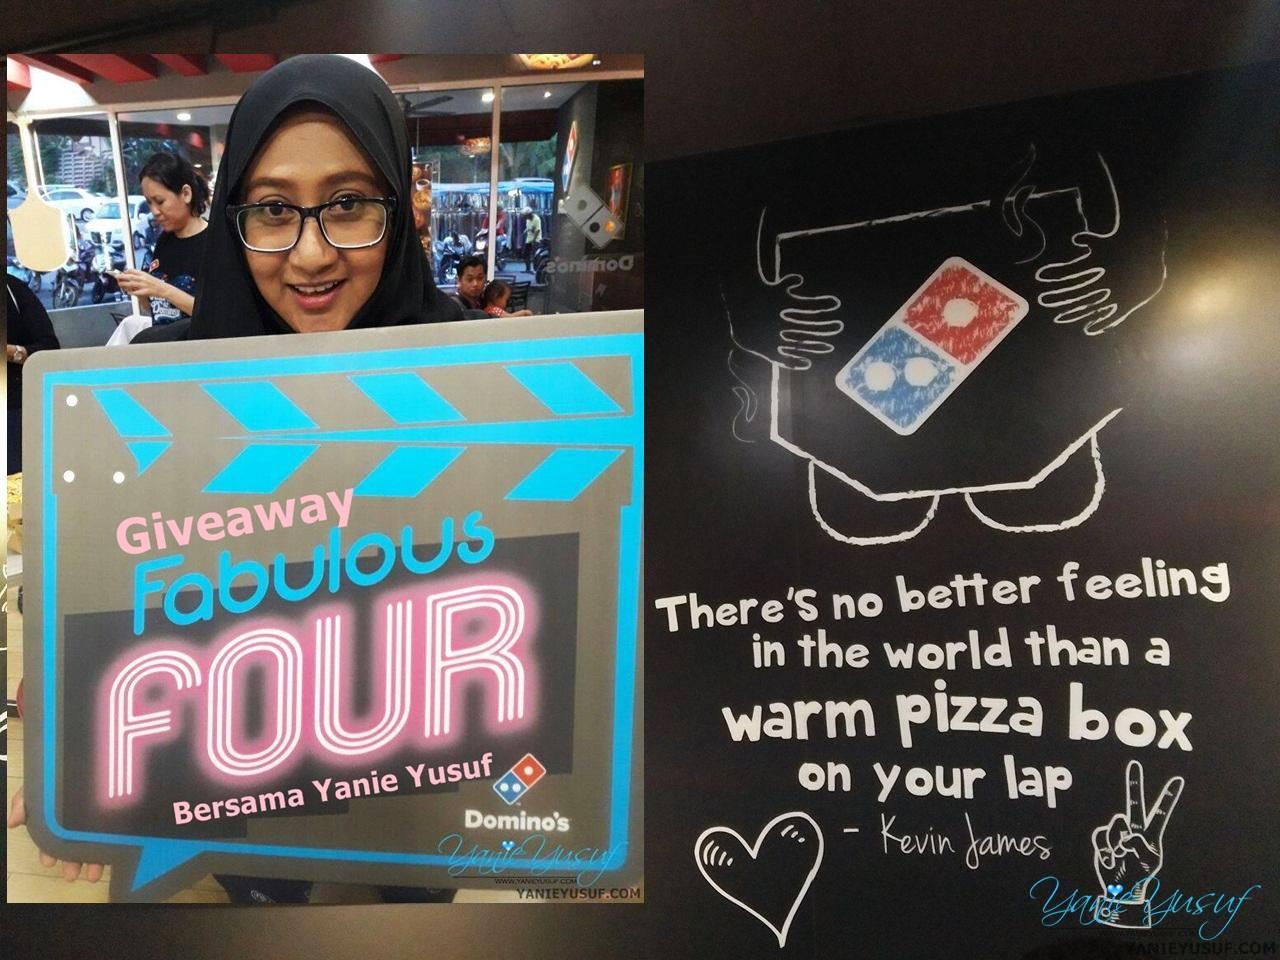 Fabulous Four Terbaru Dari Domino's Pizza Malaysia